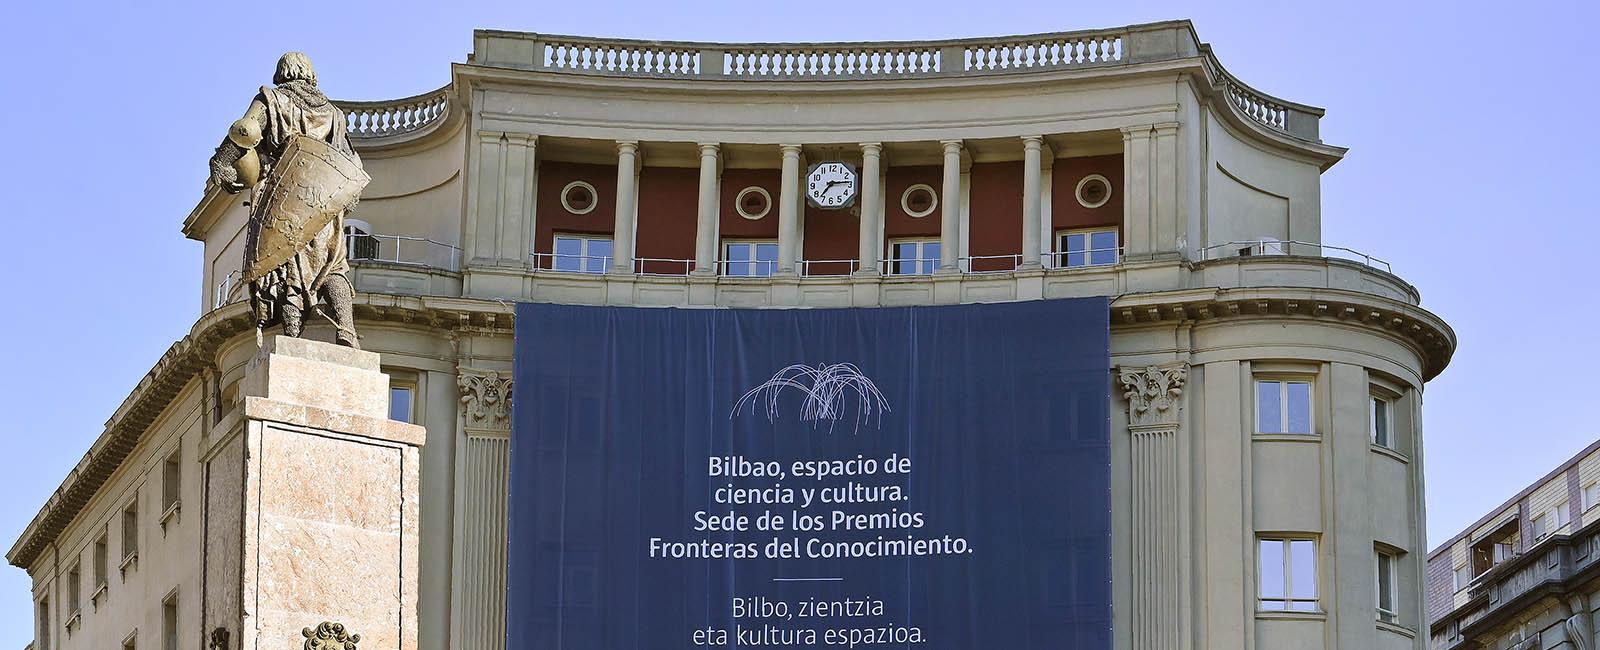 FUNDACION-BBVA-Bilbao-engalanado-Premios-FDC-31.05.19.-02.-1600×650